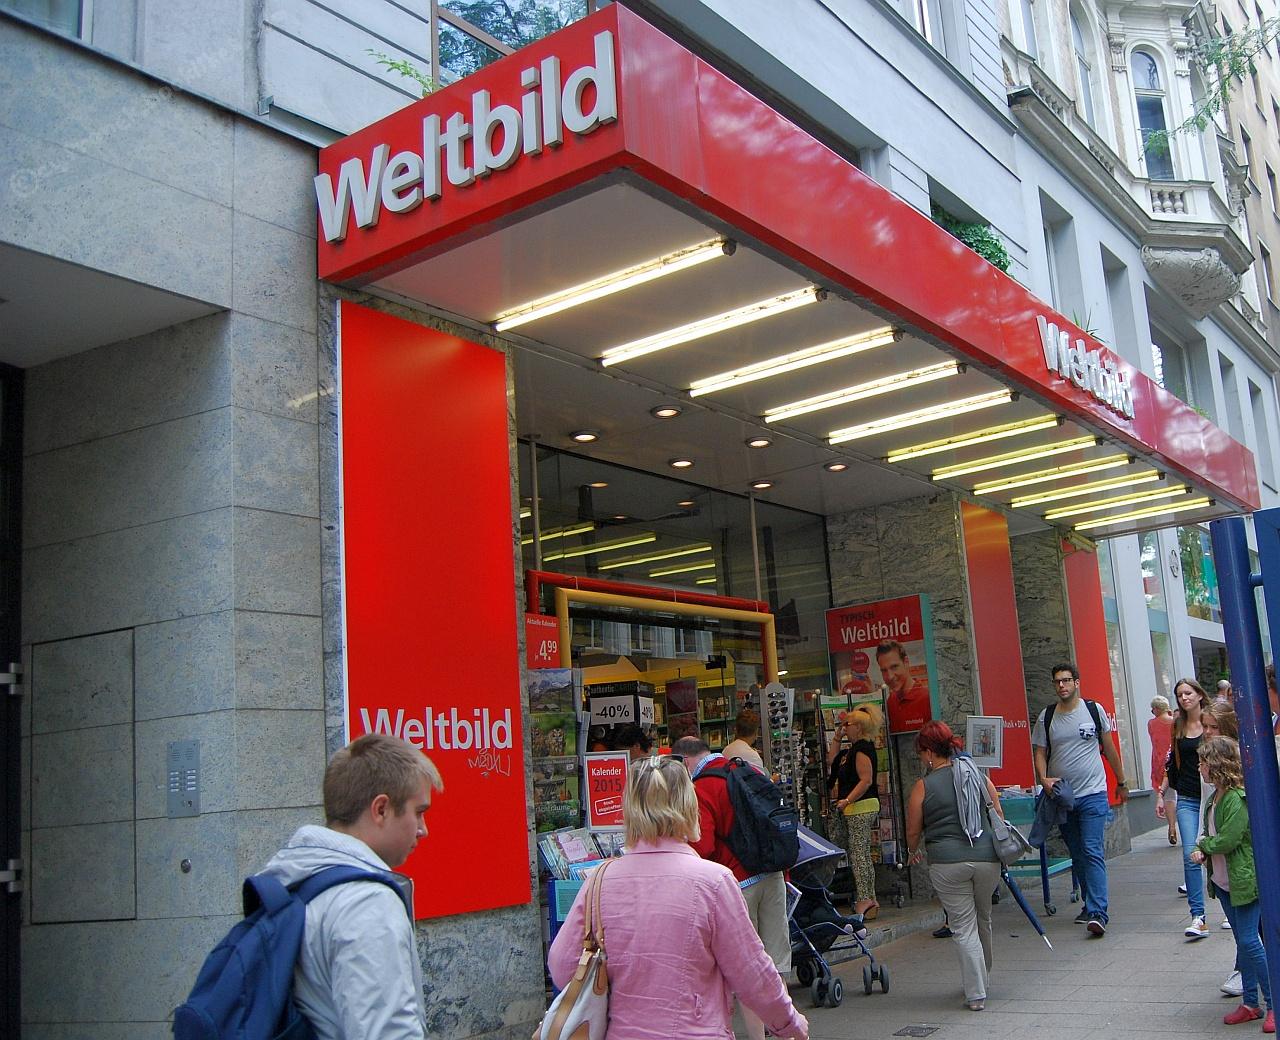 Weltbild bookshop in Wien